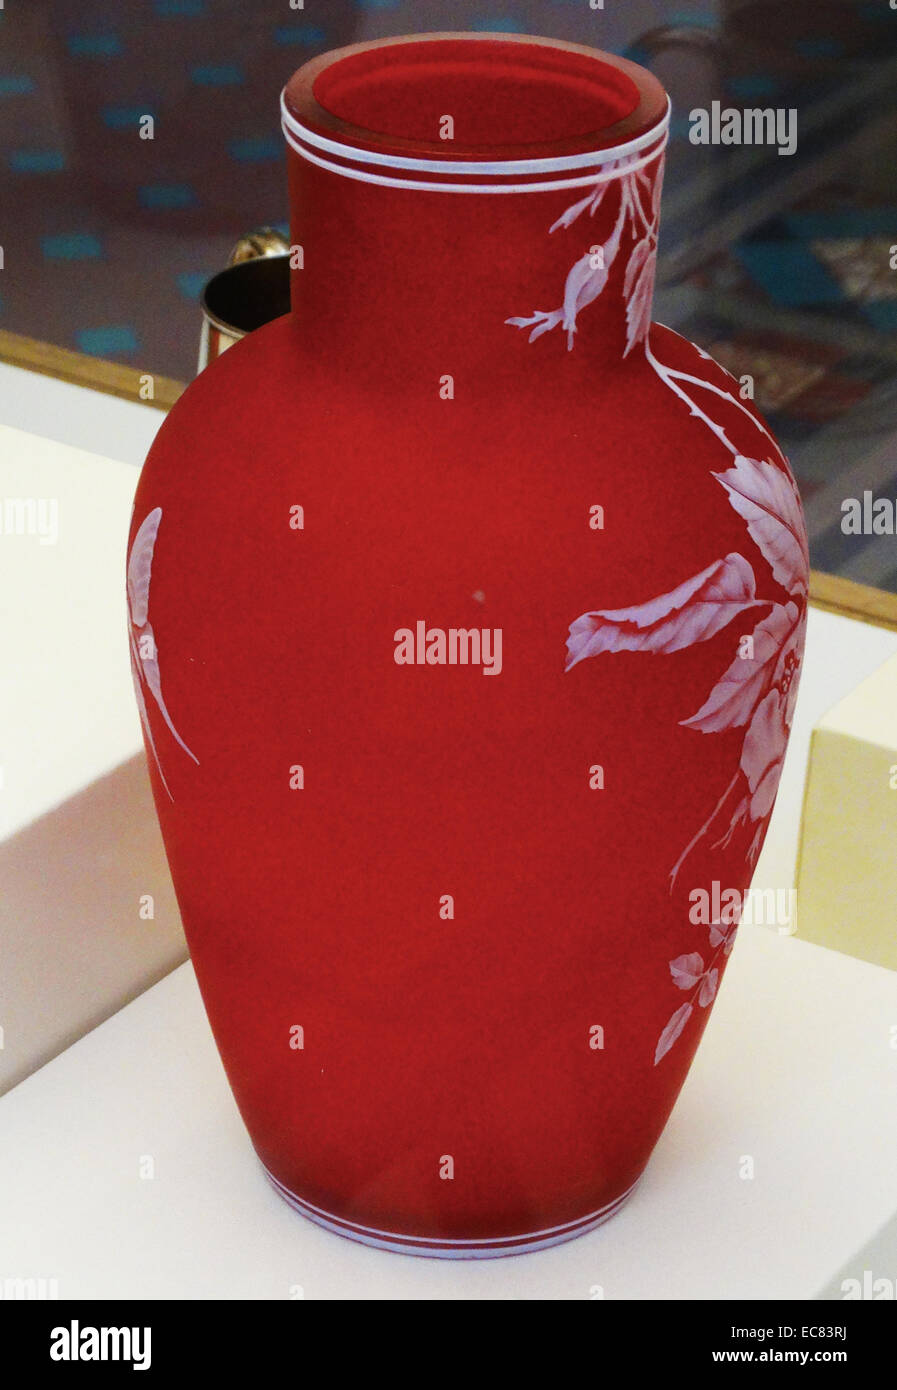 Vase; England; Stourbridge; Stevens & Williams; Cameo glass. - Stock Image